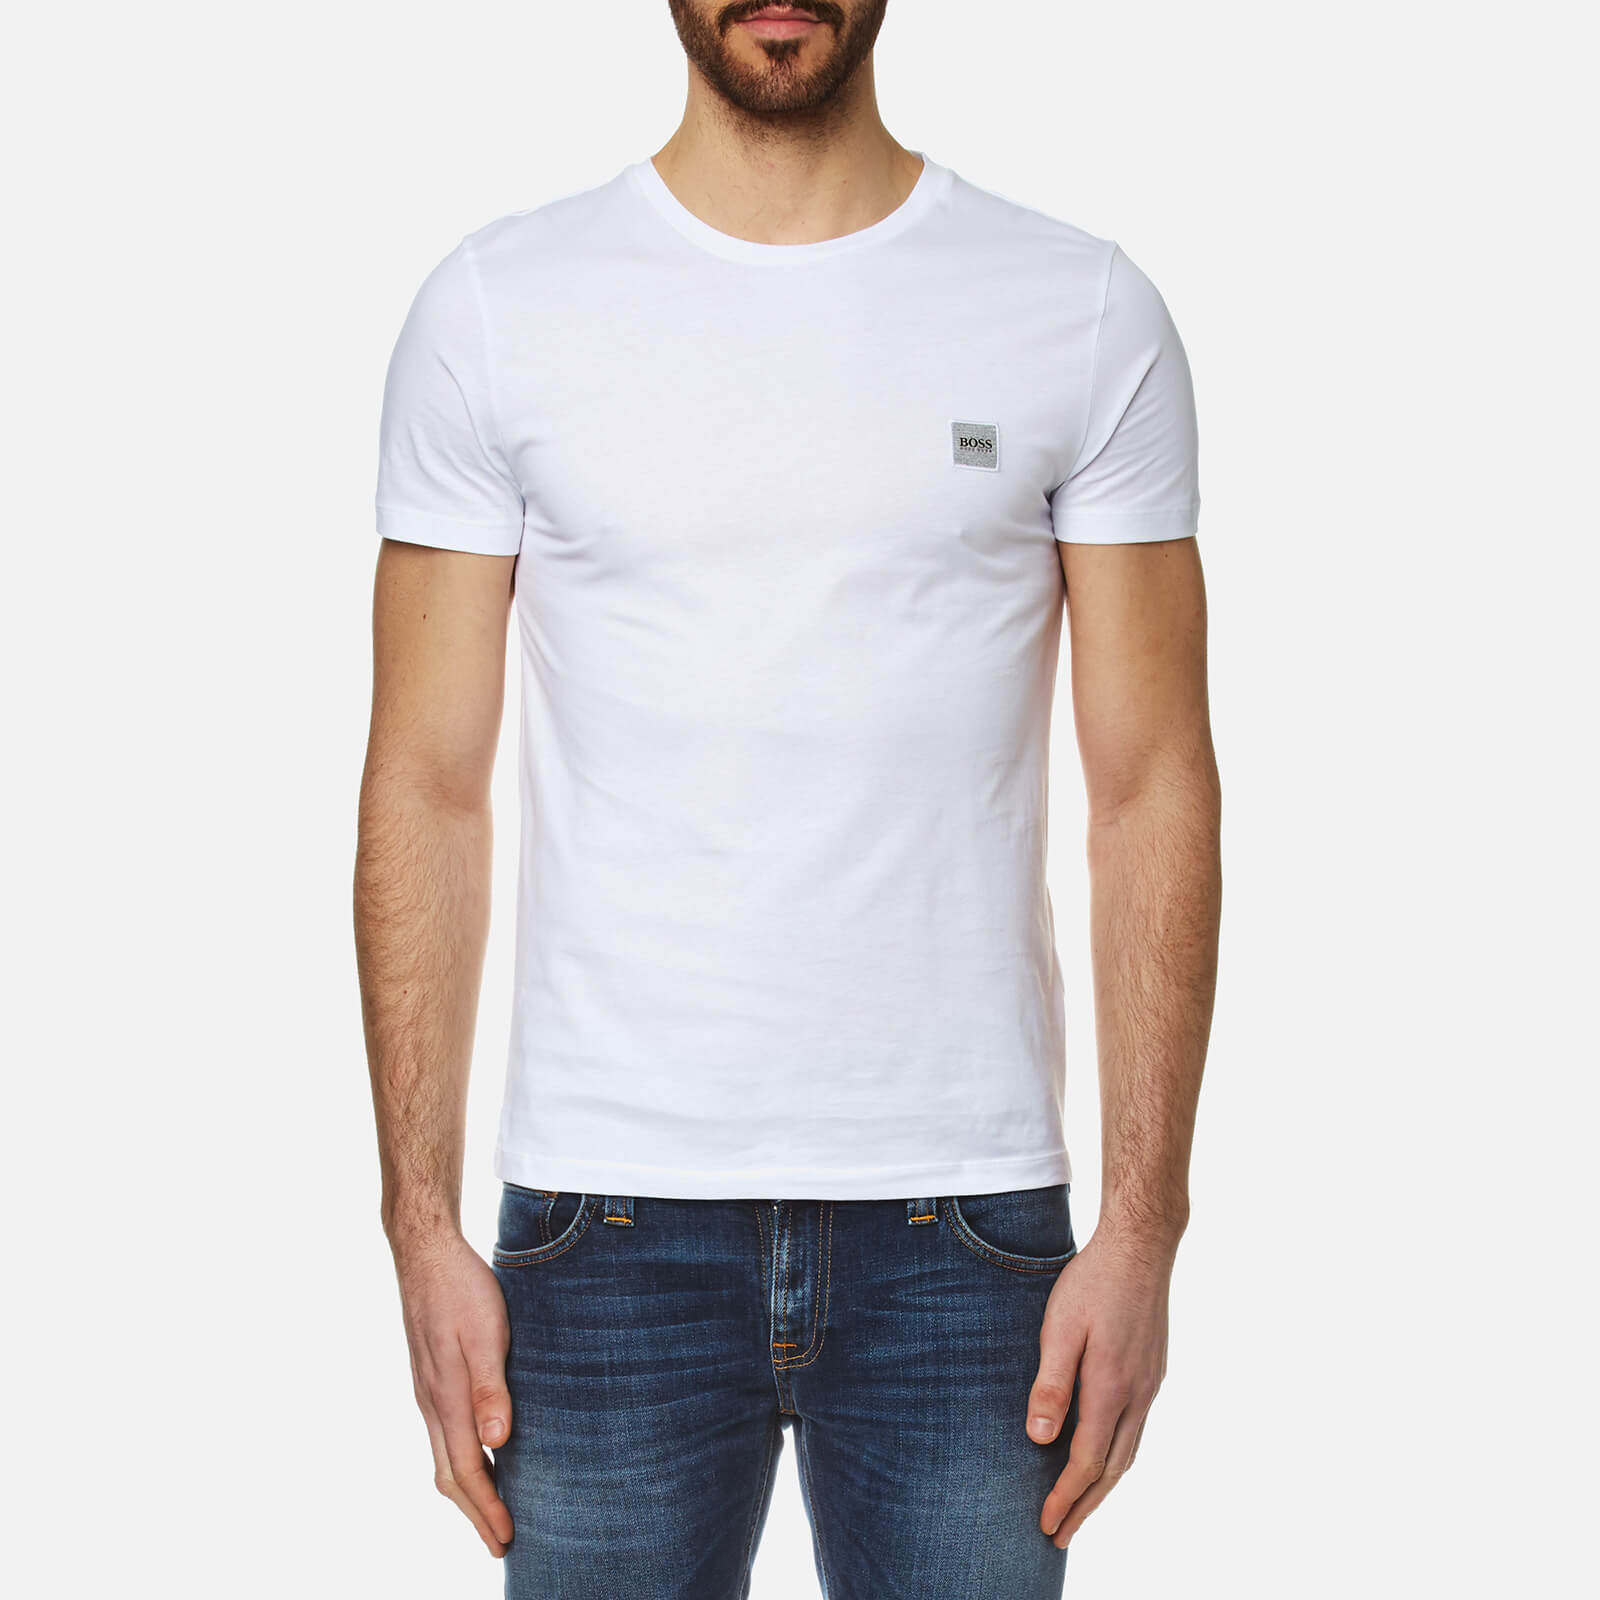 63d10bb57 BOSS Orange Men's Tommi Crew Neck T-Shirt - White - Free UK Delivery over  £50